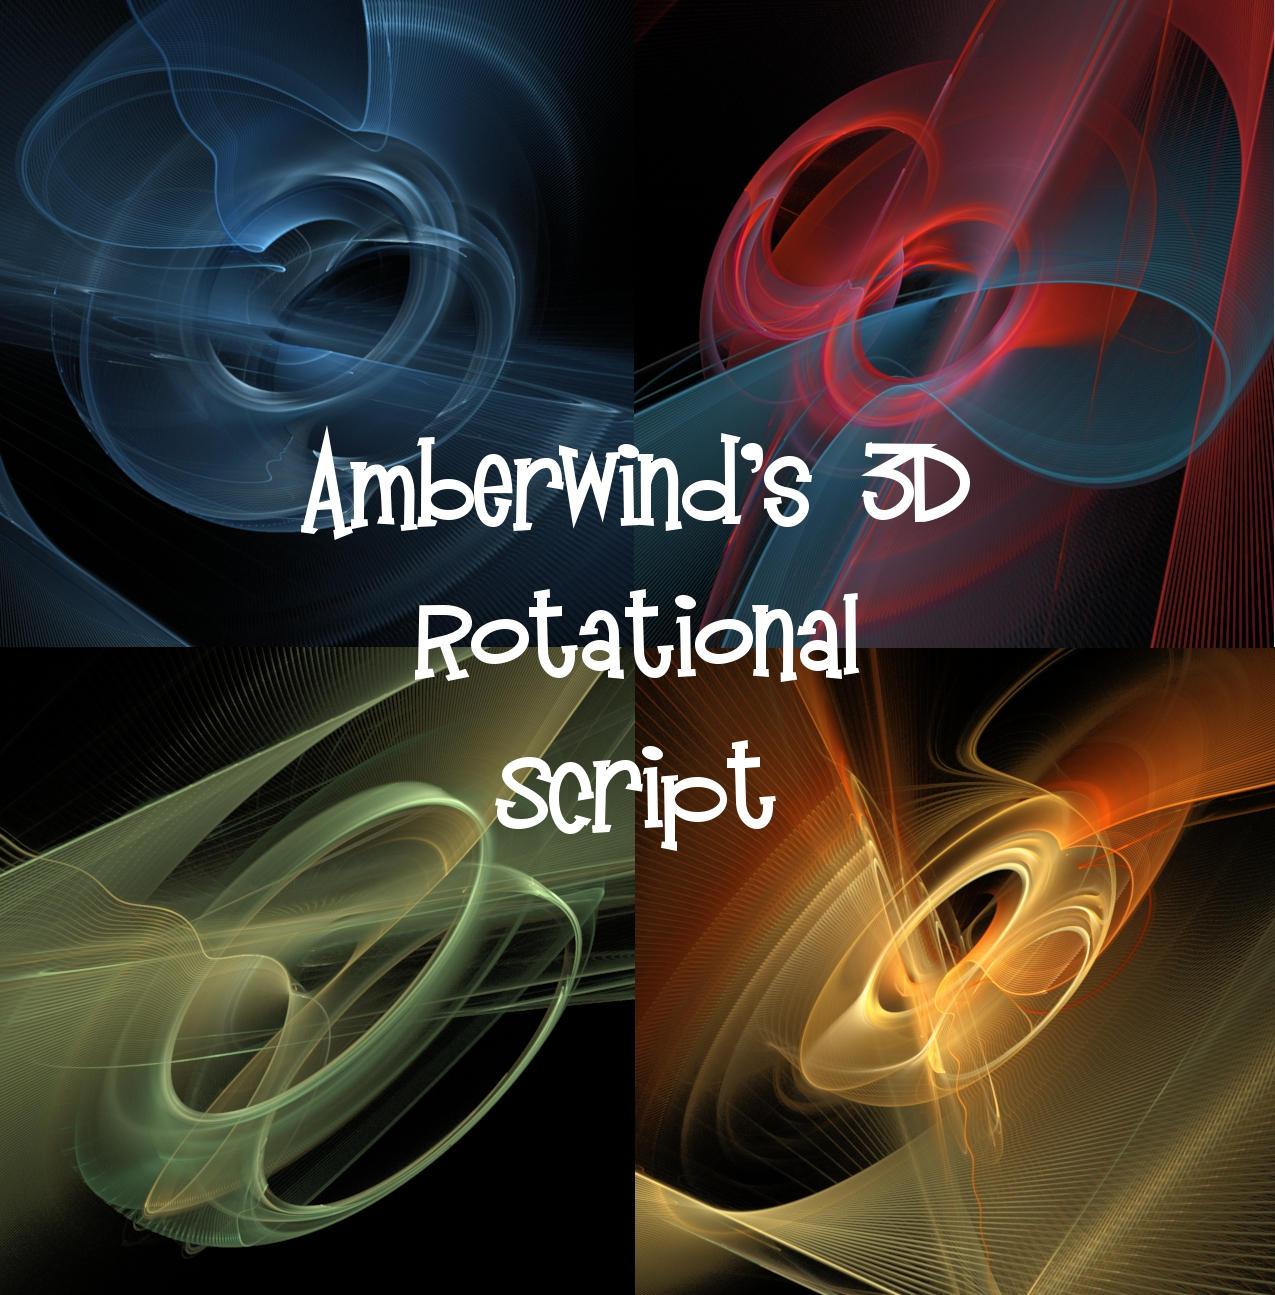 Amberwind's 3D Rotational Script by amberwind